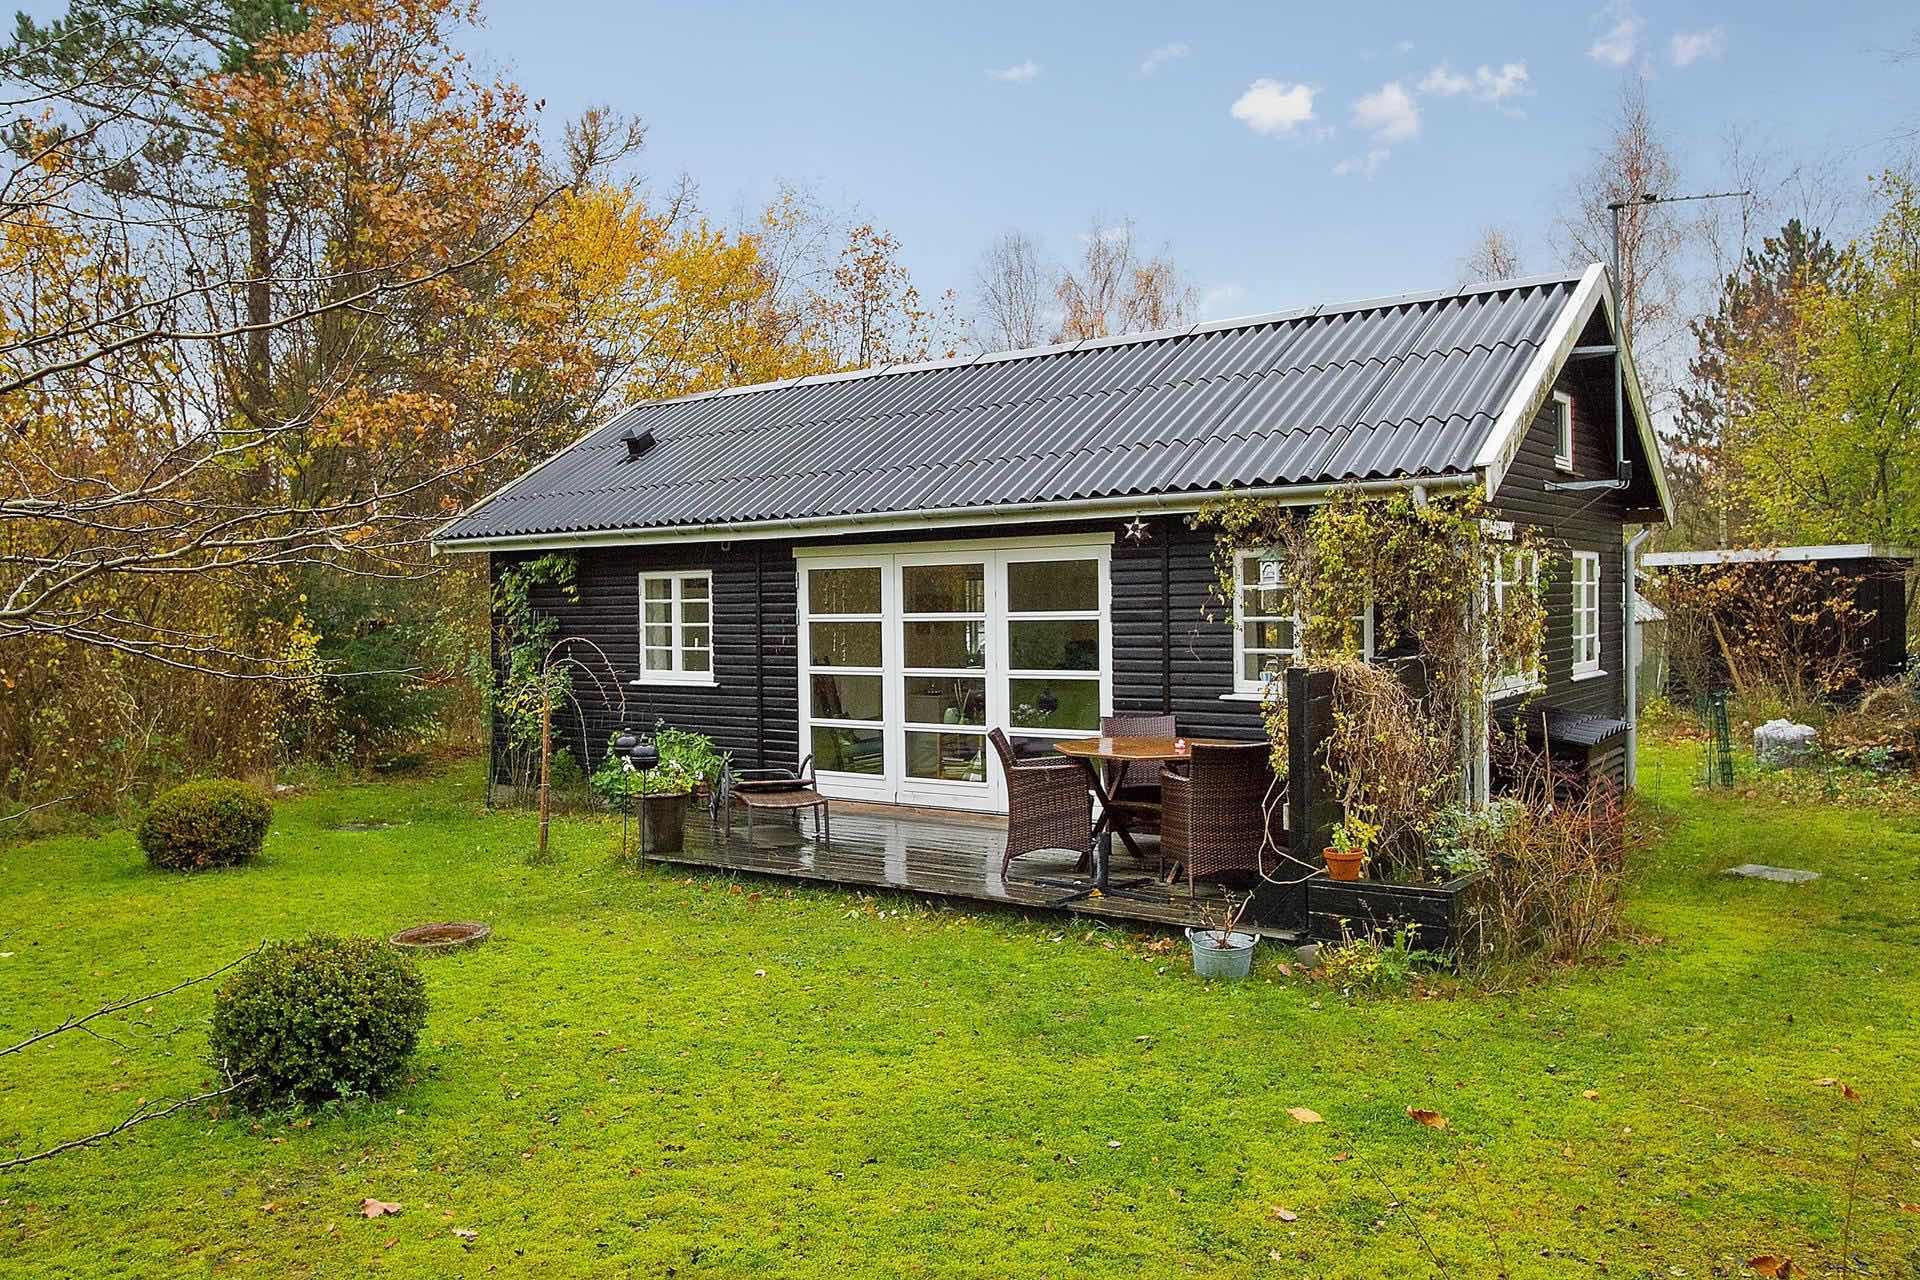 Black And White Danish Summerhouse